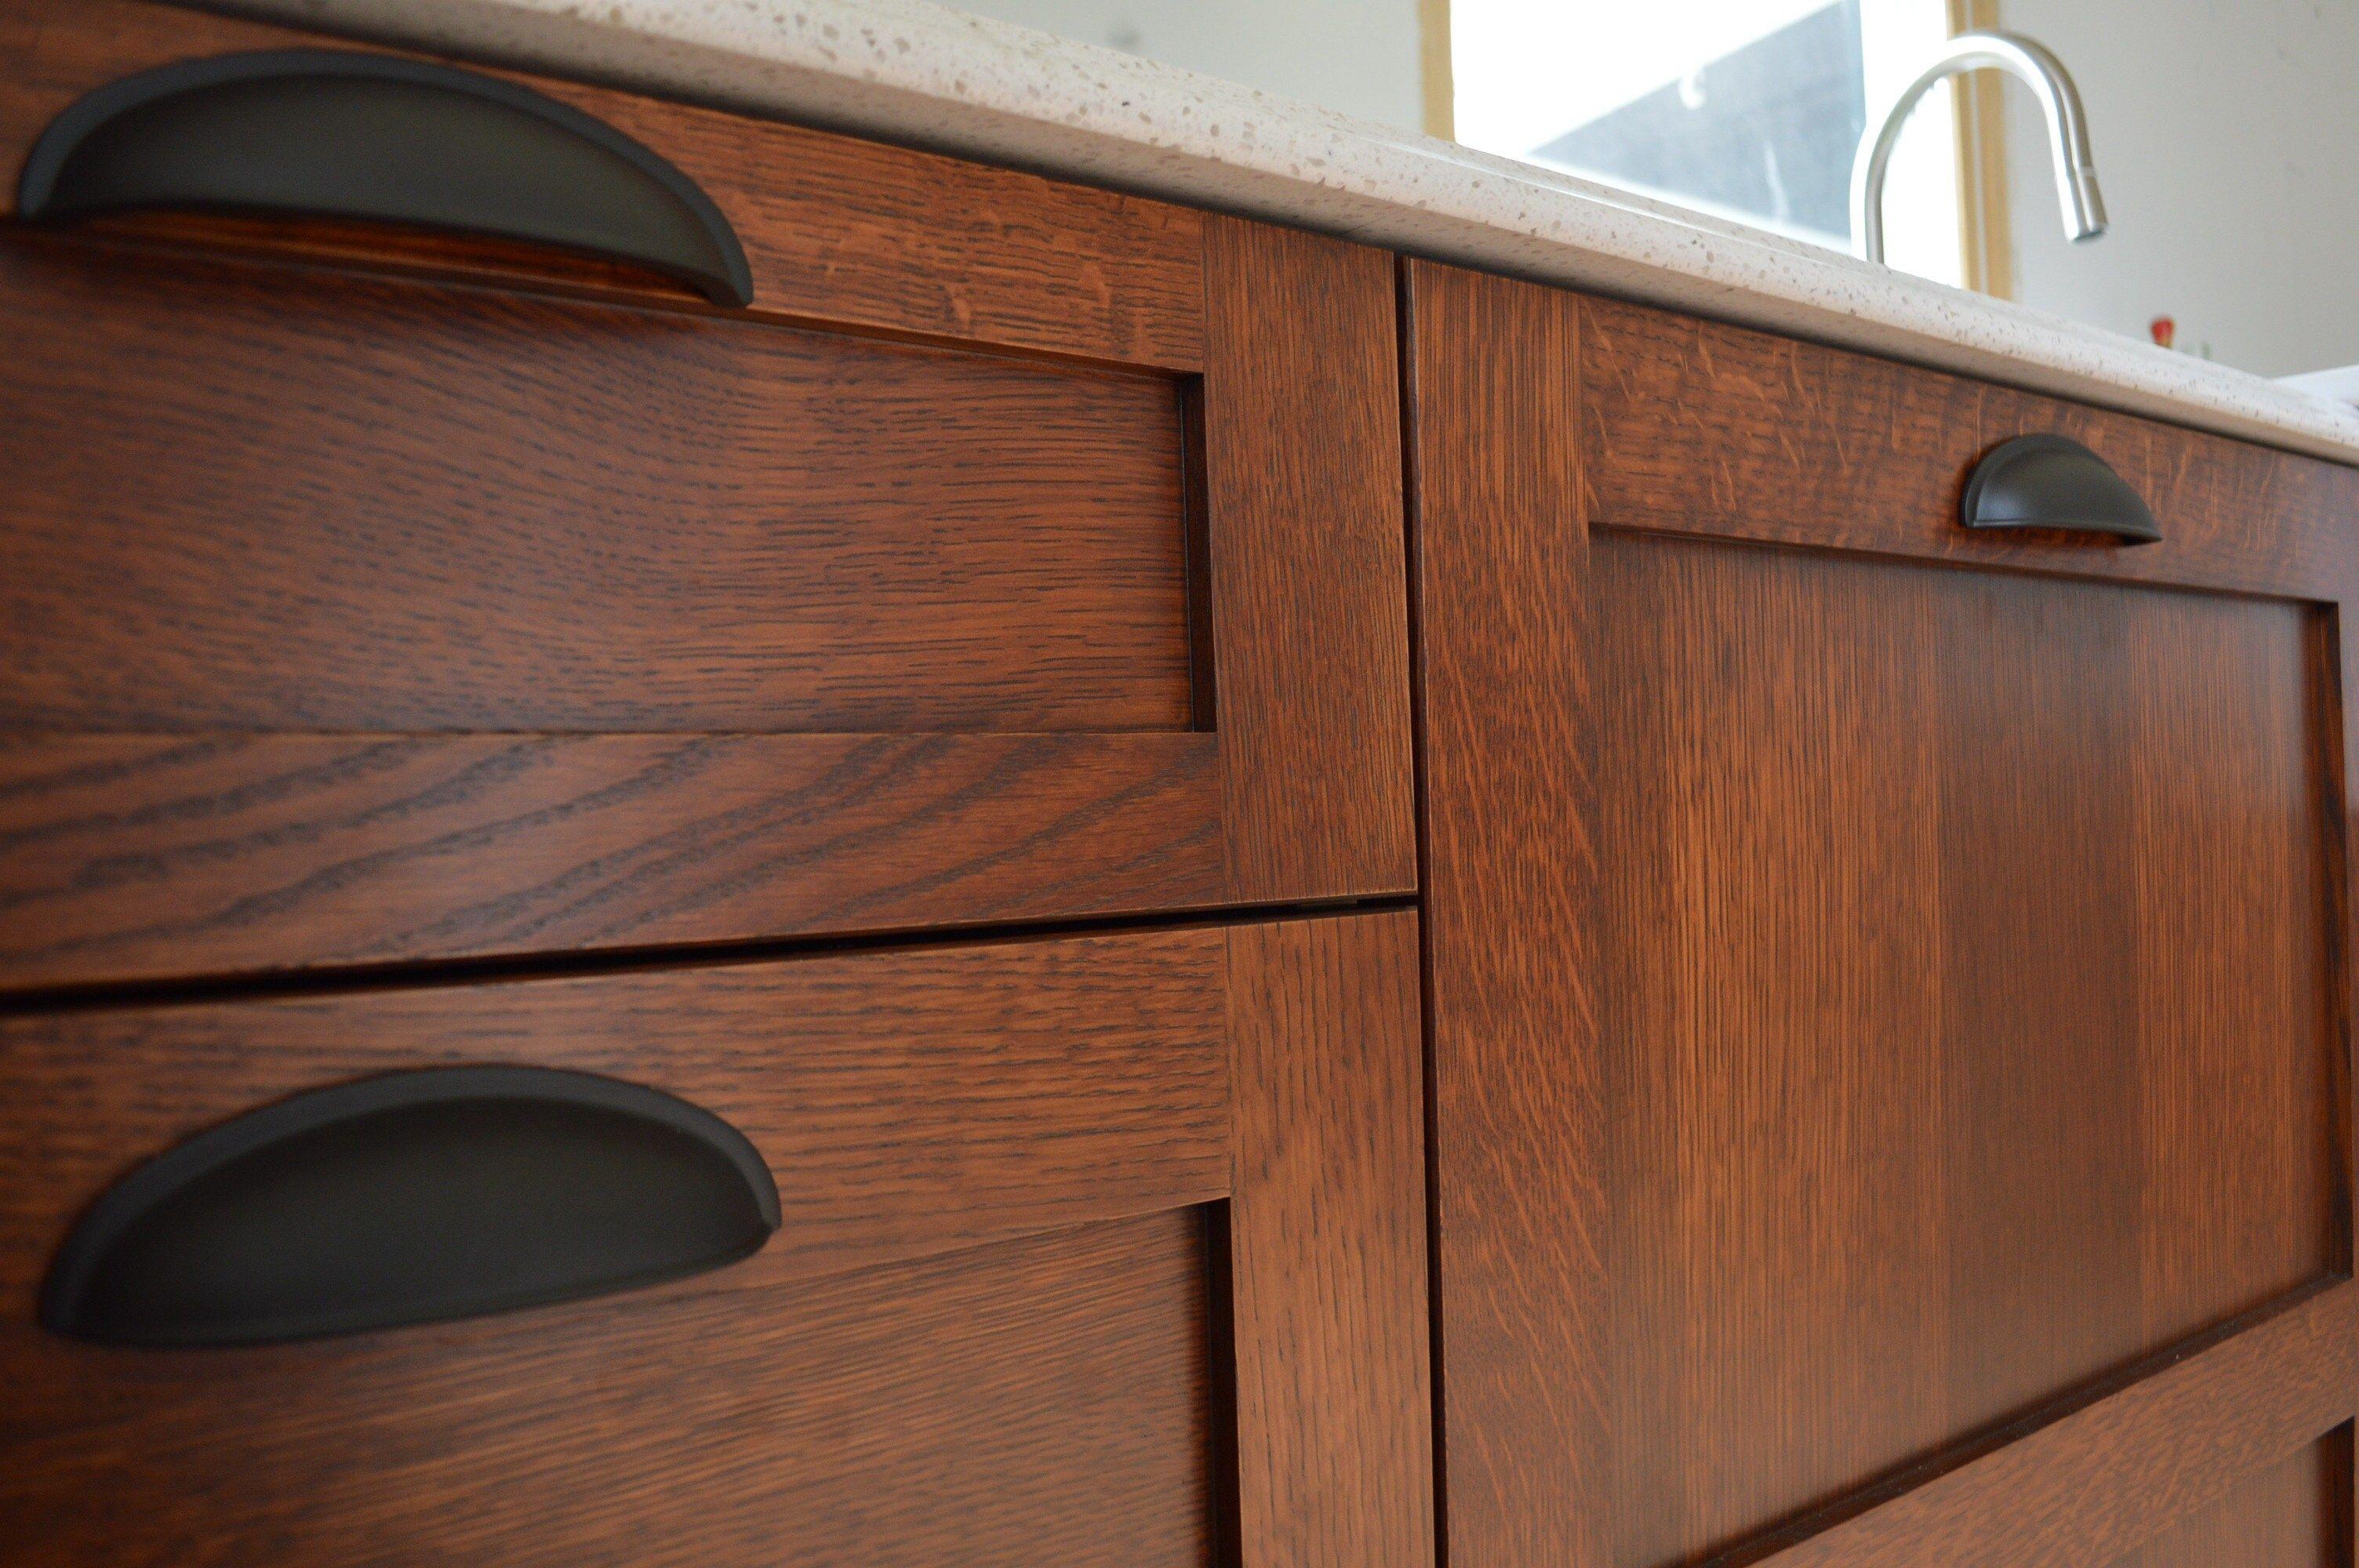 Image16 Jpg 3 008 2 000 Pixels Walnut Kitchen Cabinets Modern Walnut Kitchen Kitchen Styling